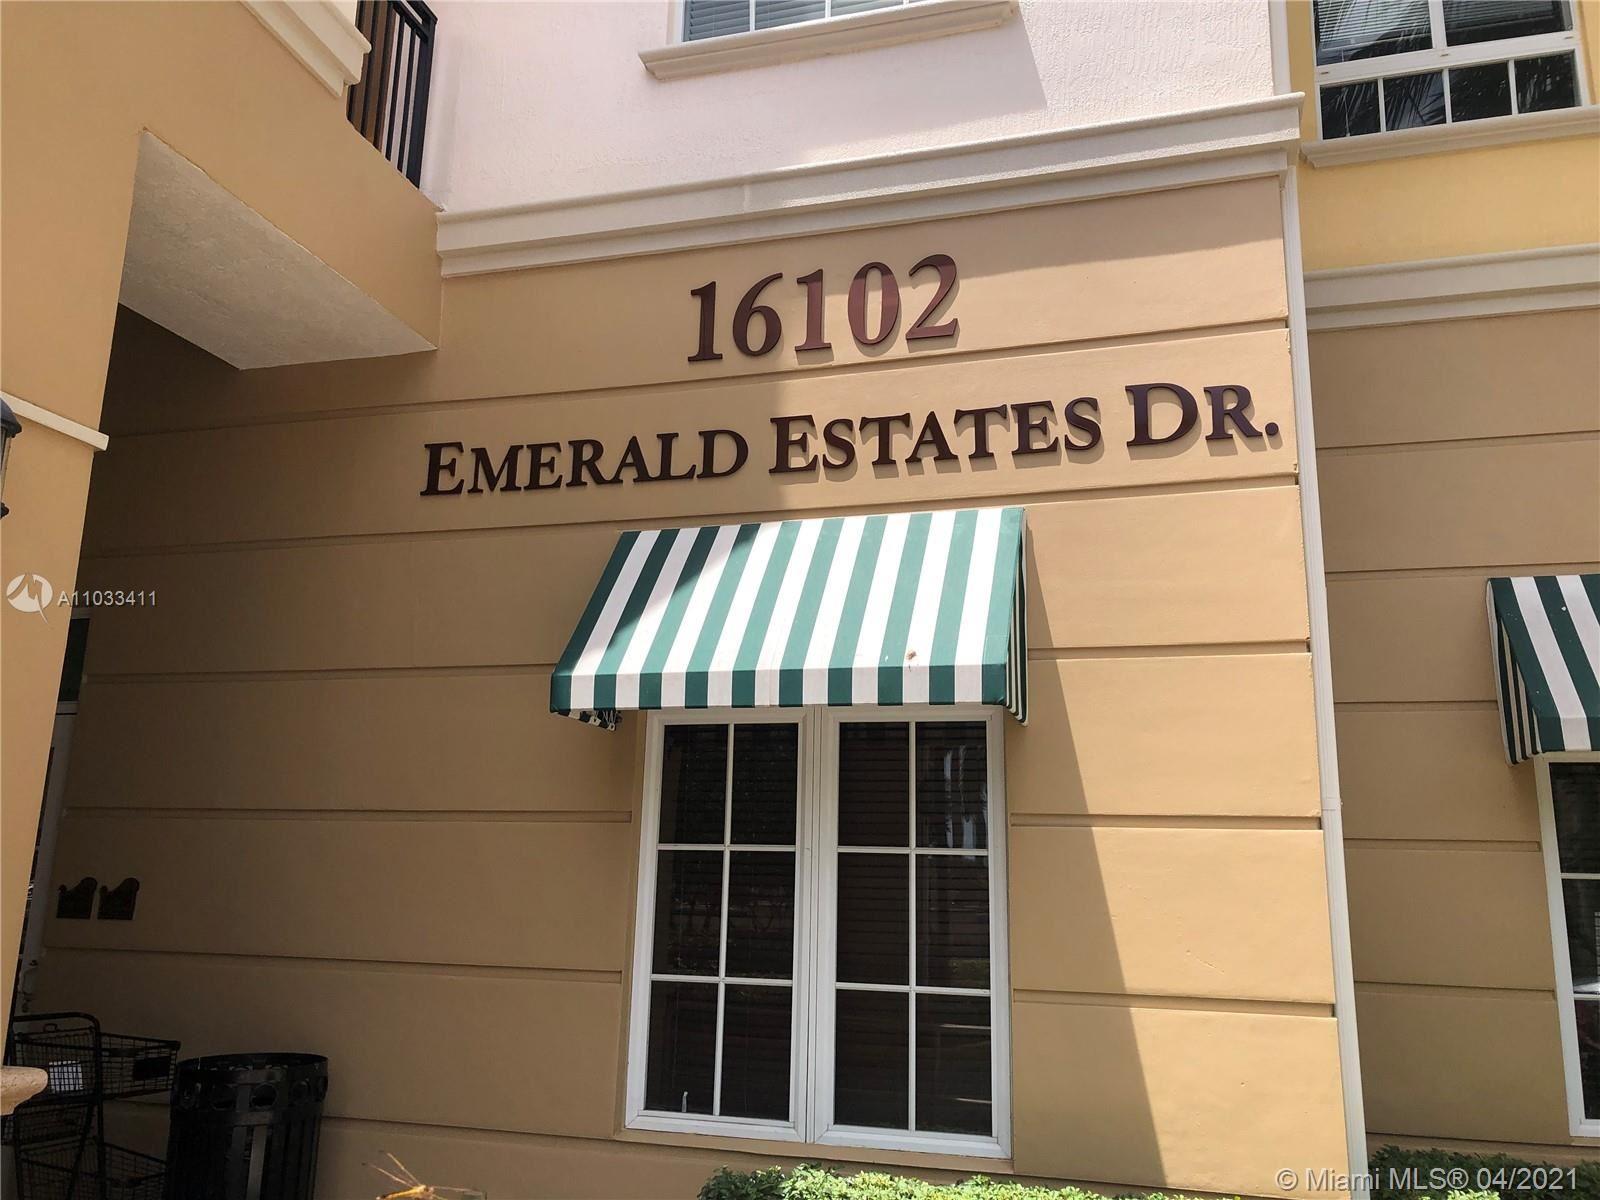 16102 Emerald Estates Dr #232, Weston, FL 33331 - #: A11033411